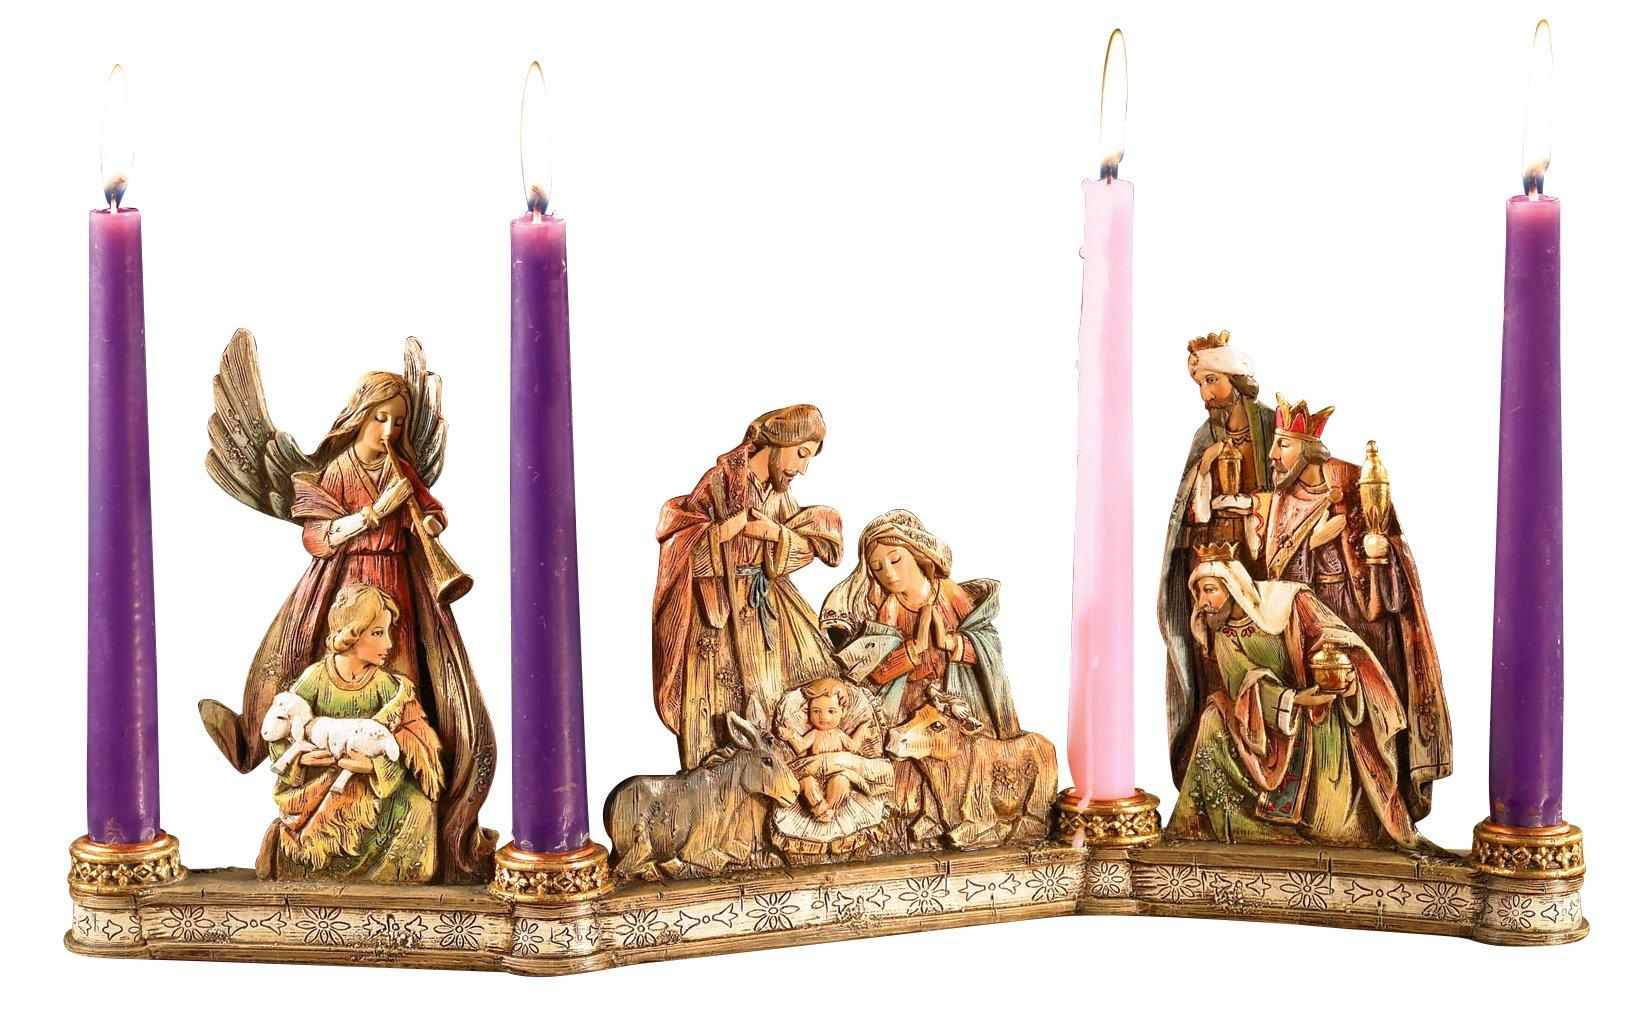 CB Gift Avalon Gallery Advent Candleholder, Holy Family Nativity Scene